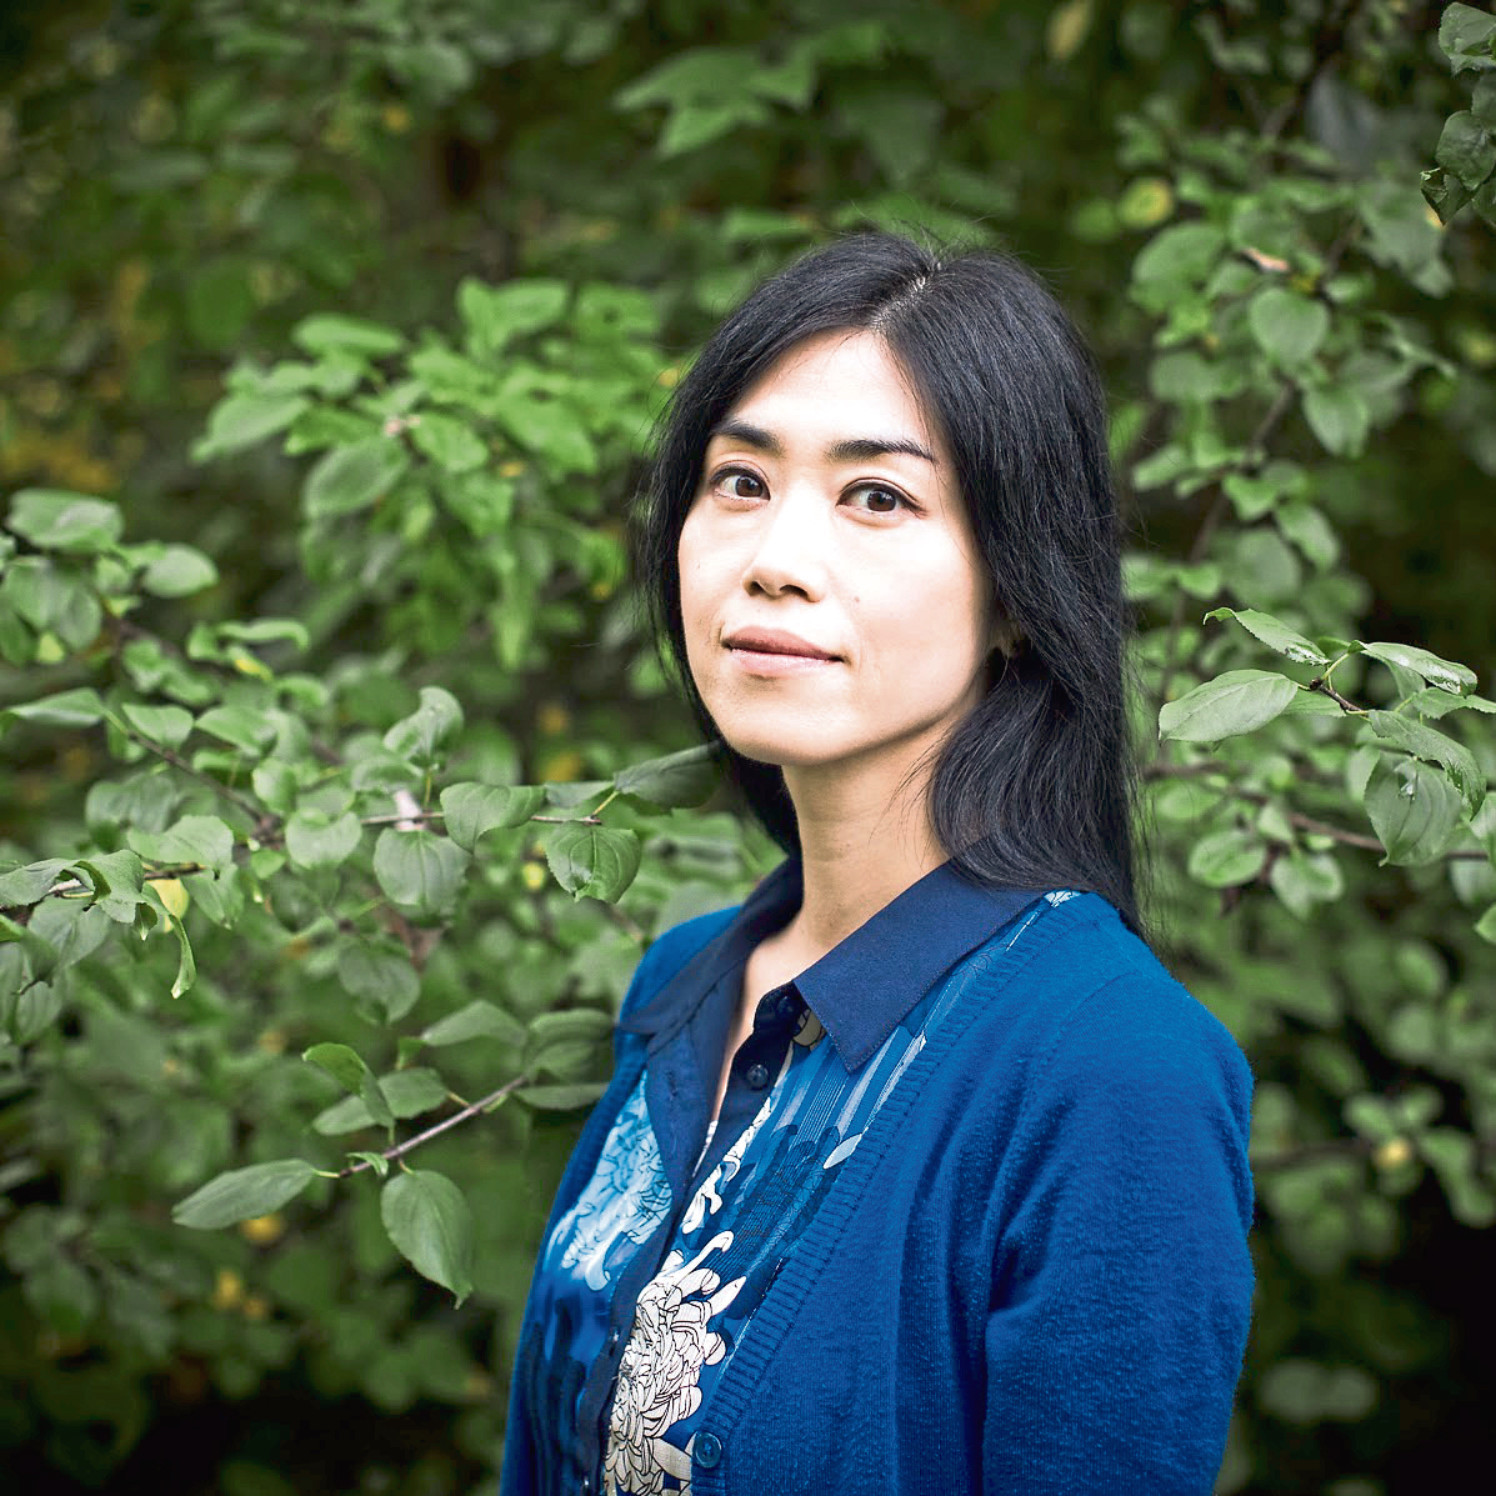 Film-maker and photographer Toko Shiiki